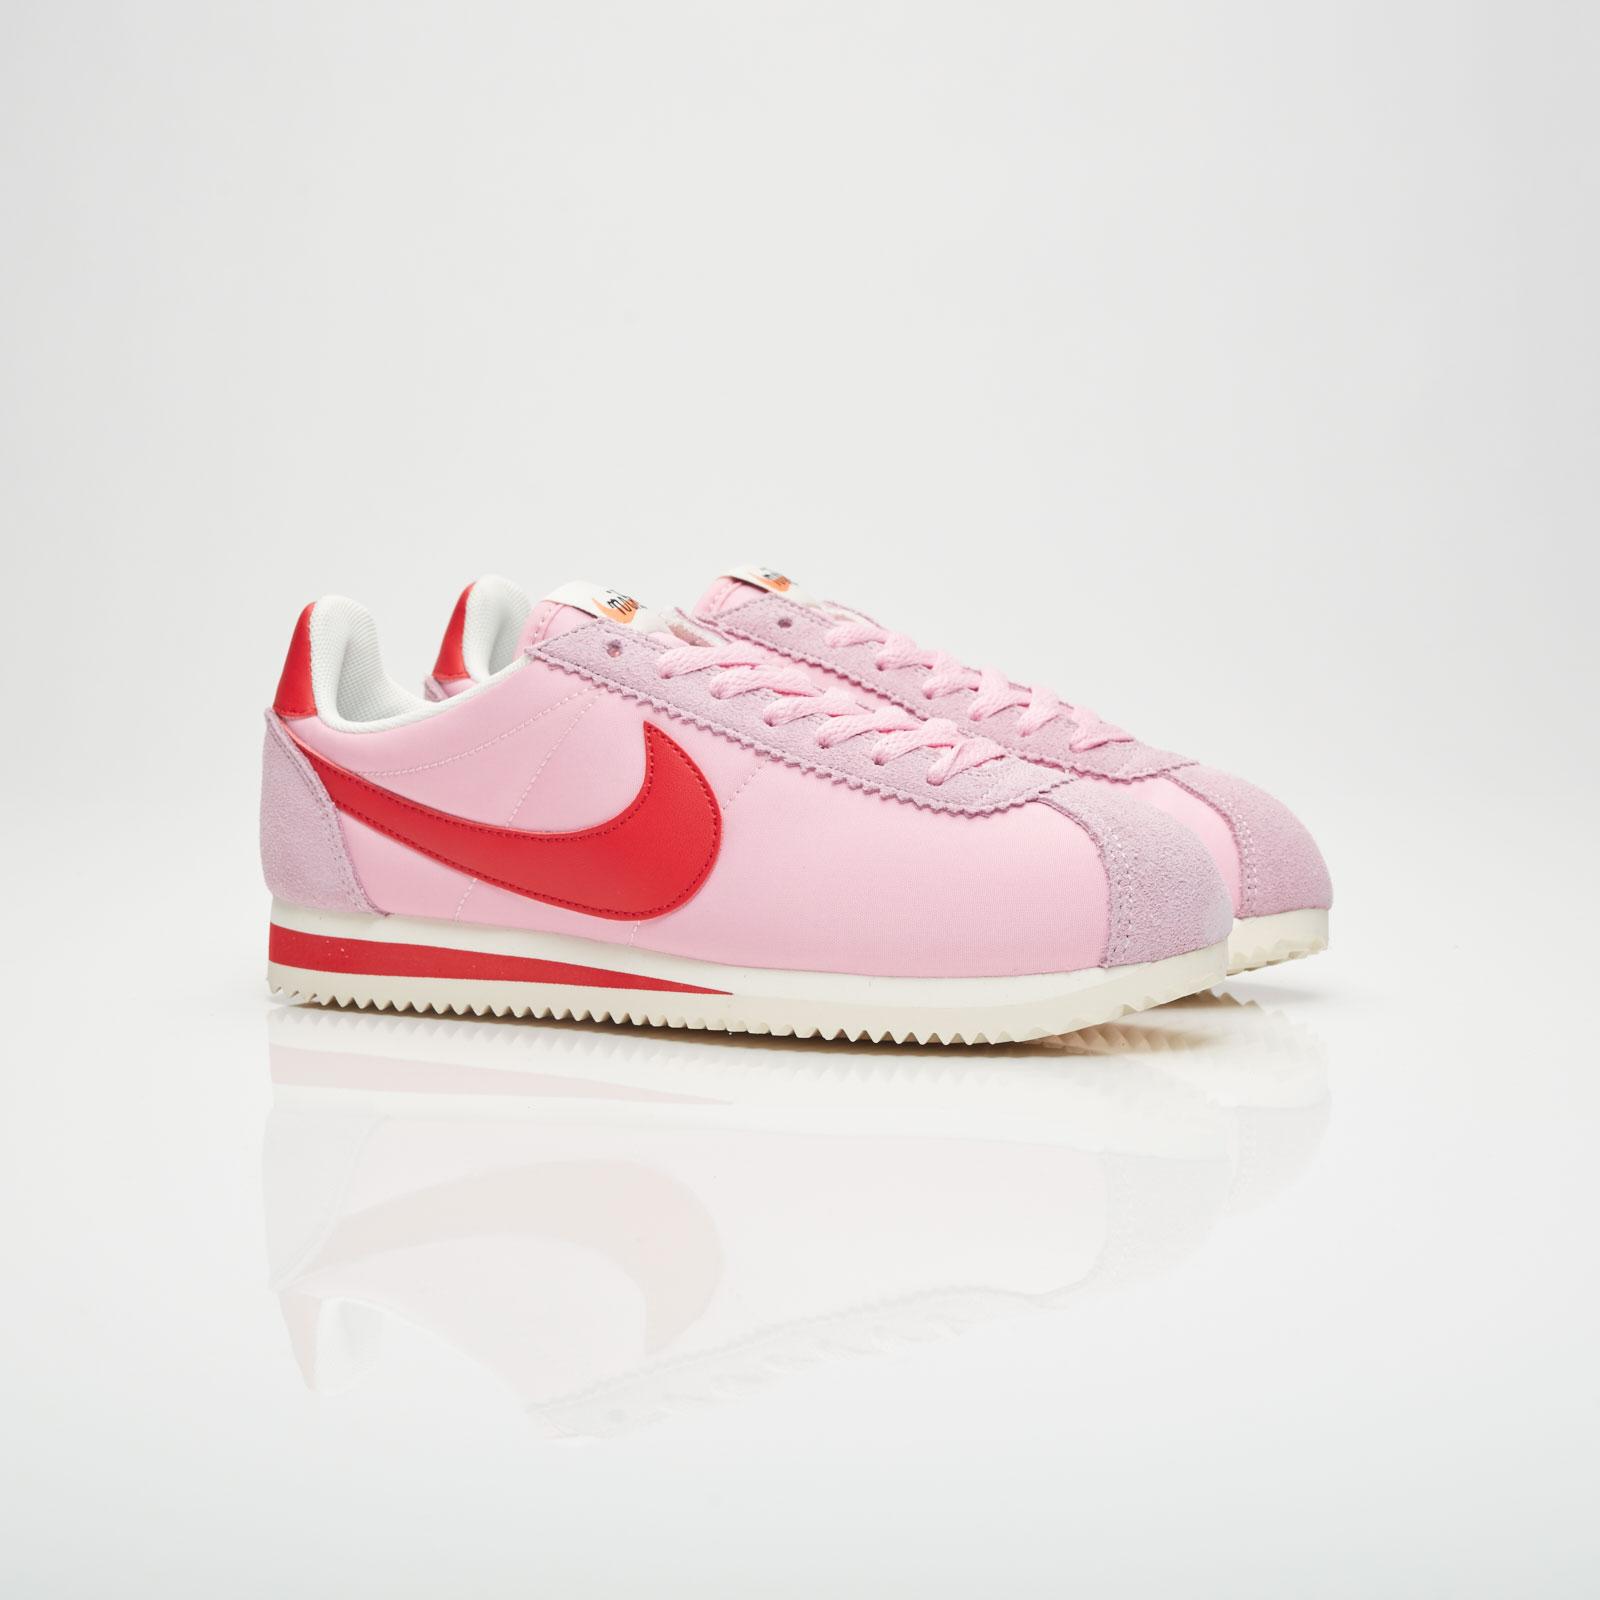 Nike Wmns Classic Cortez Nylon Premium - 882258-601 - Sneakersnstuff ... 278bbbabde